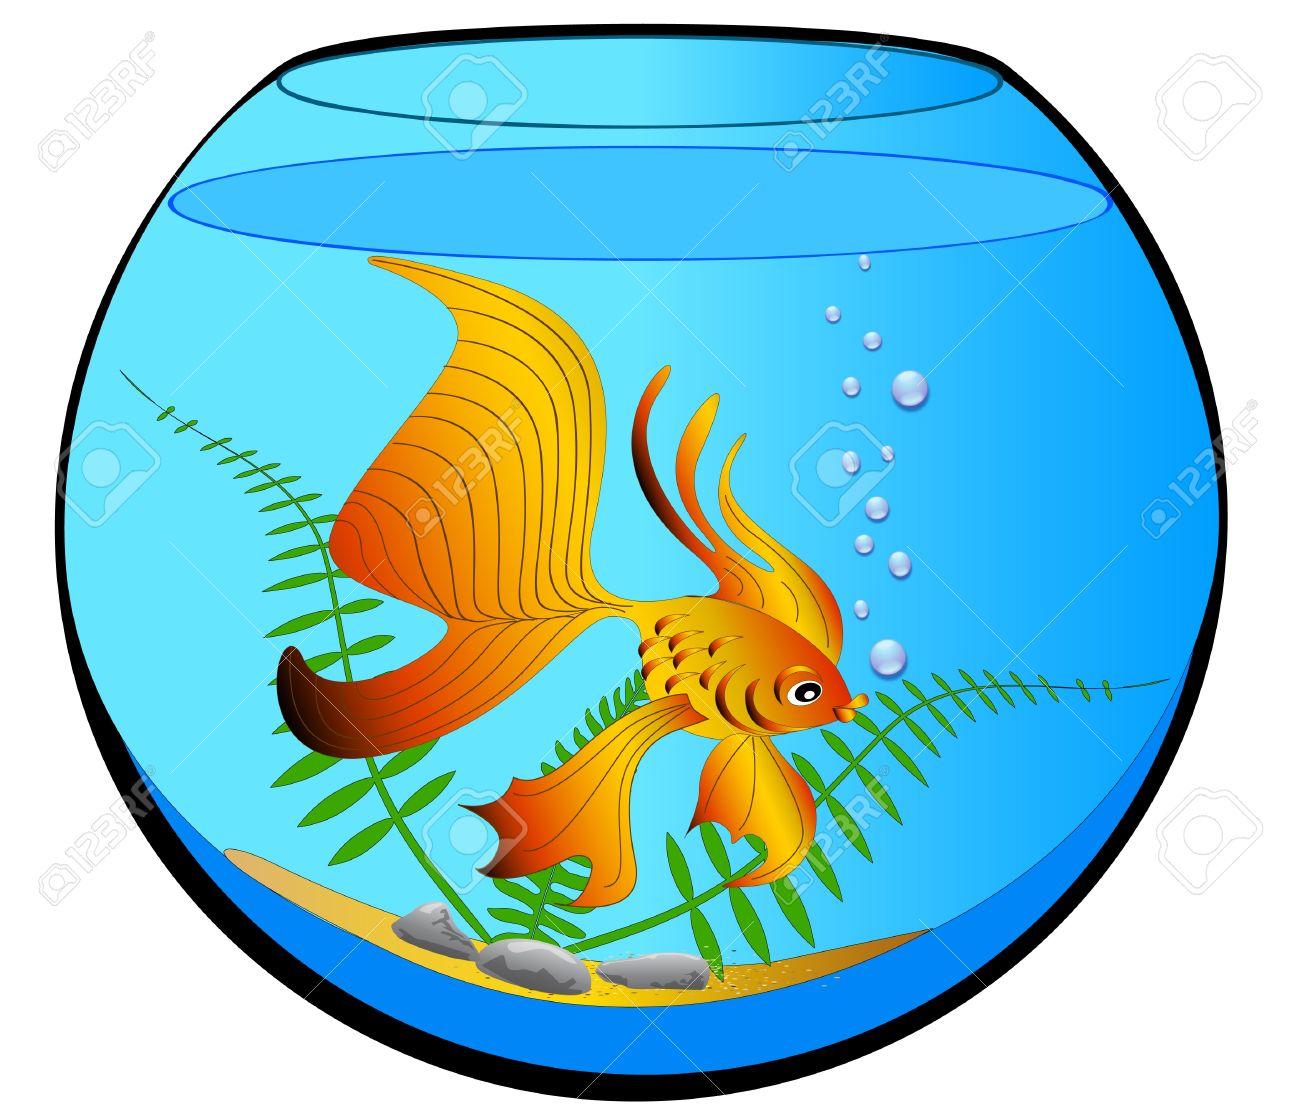 Freshwater fish clipart - Tropical Fresh Water Fish Illustration Aquarium With Gold Fish And Algae Illustration